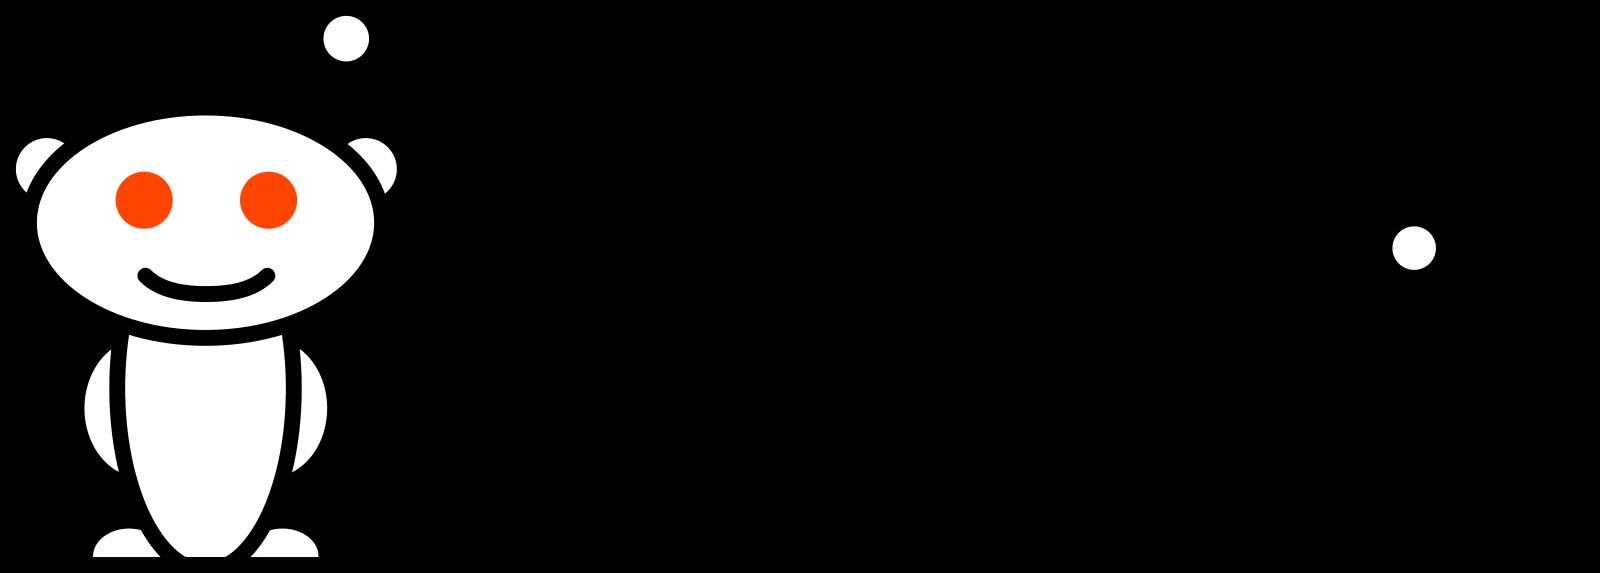 reddit logo 5 - Reddit Logo